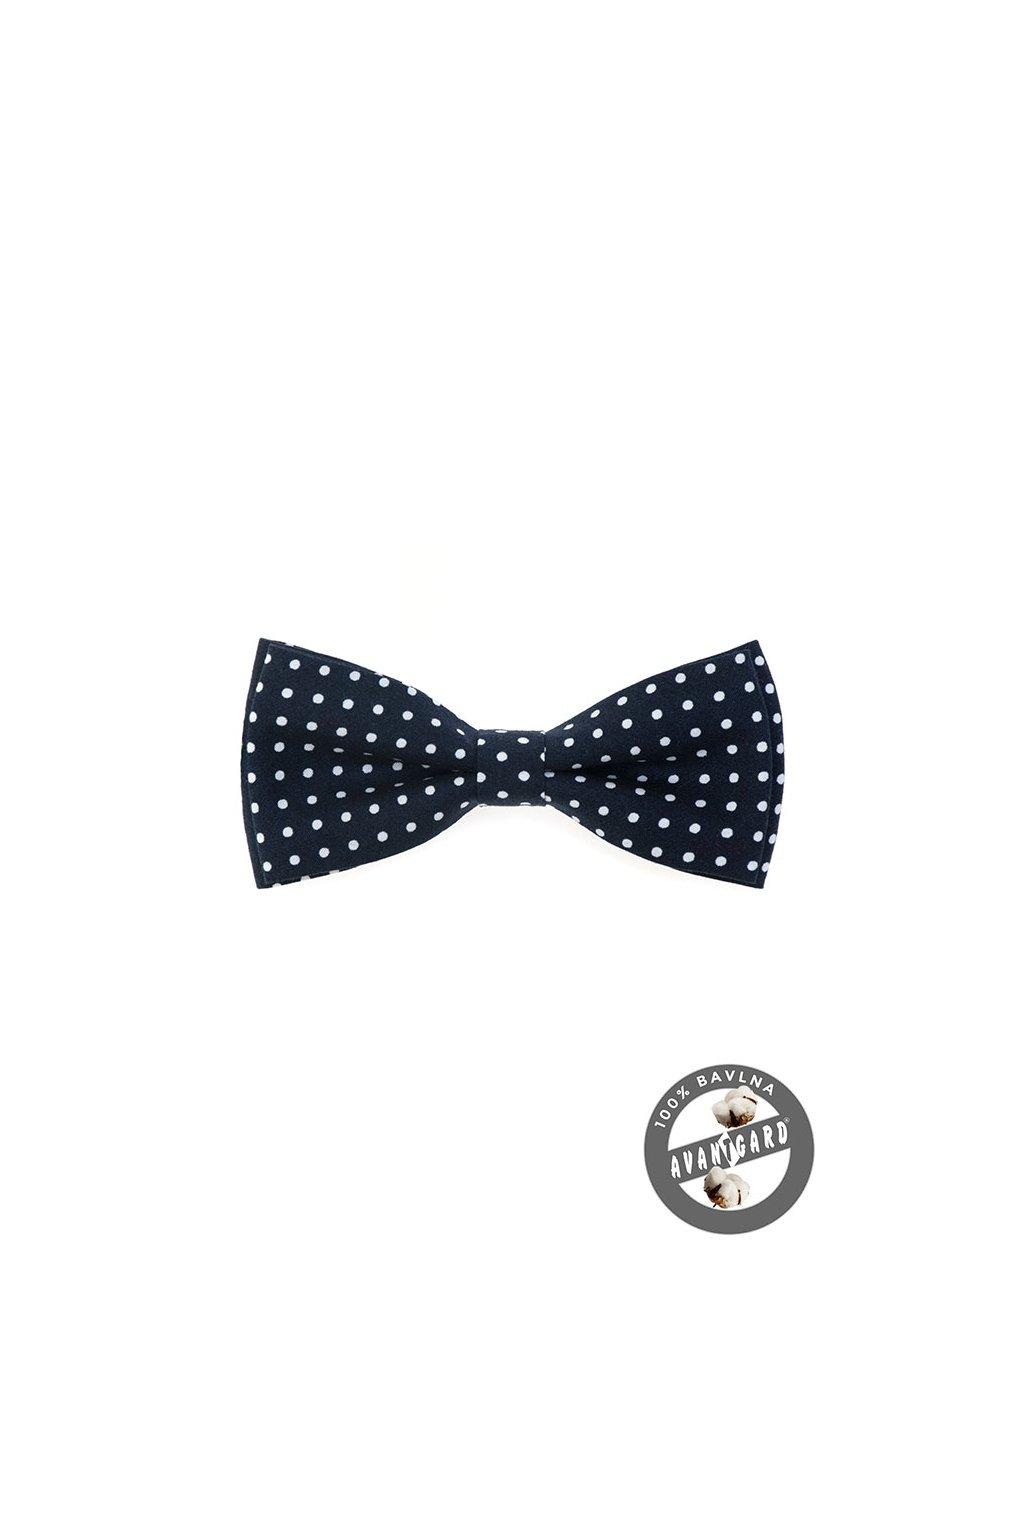 Motýlek PREMIUM bavlněný modrá s bílým puntíkem 600 - 5138